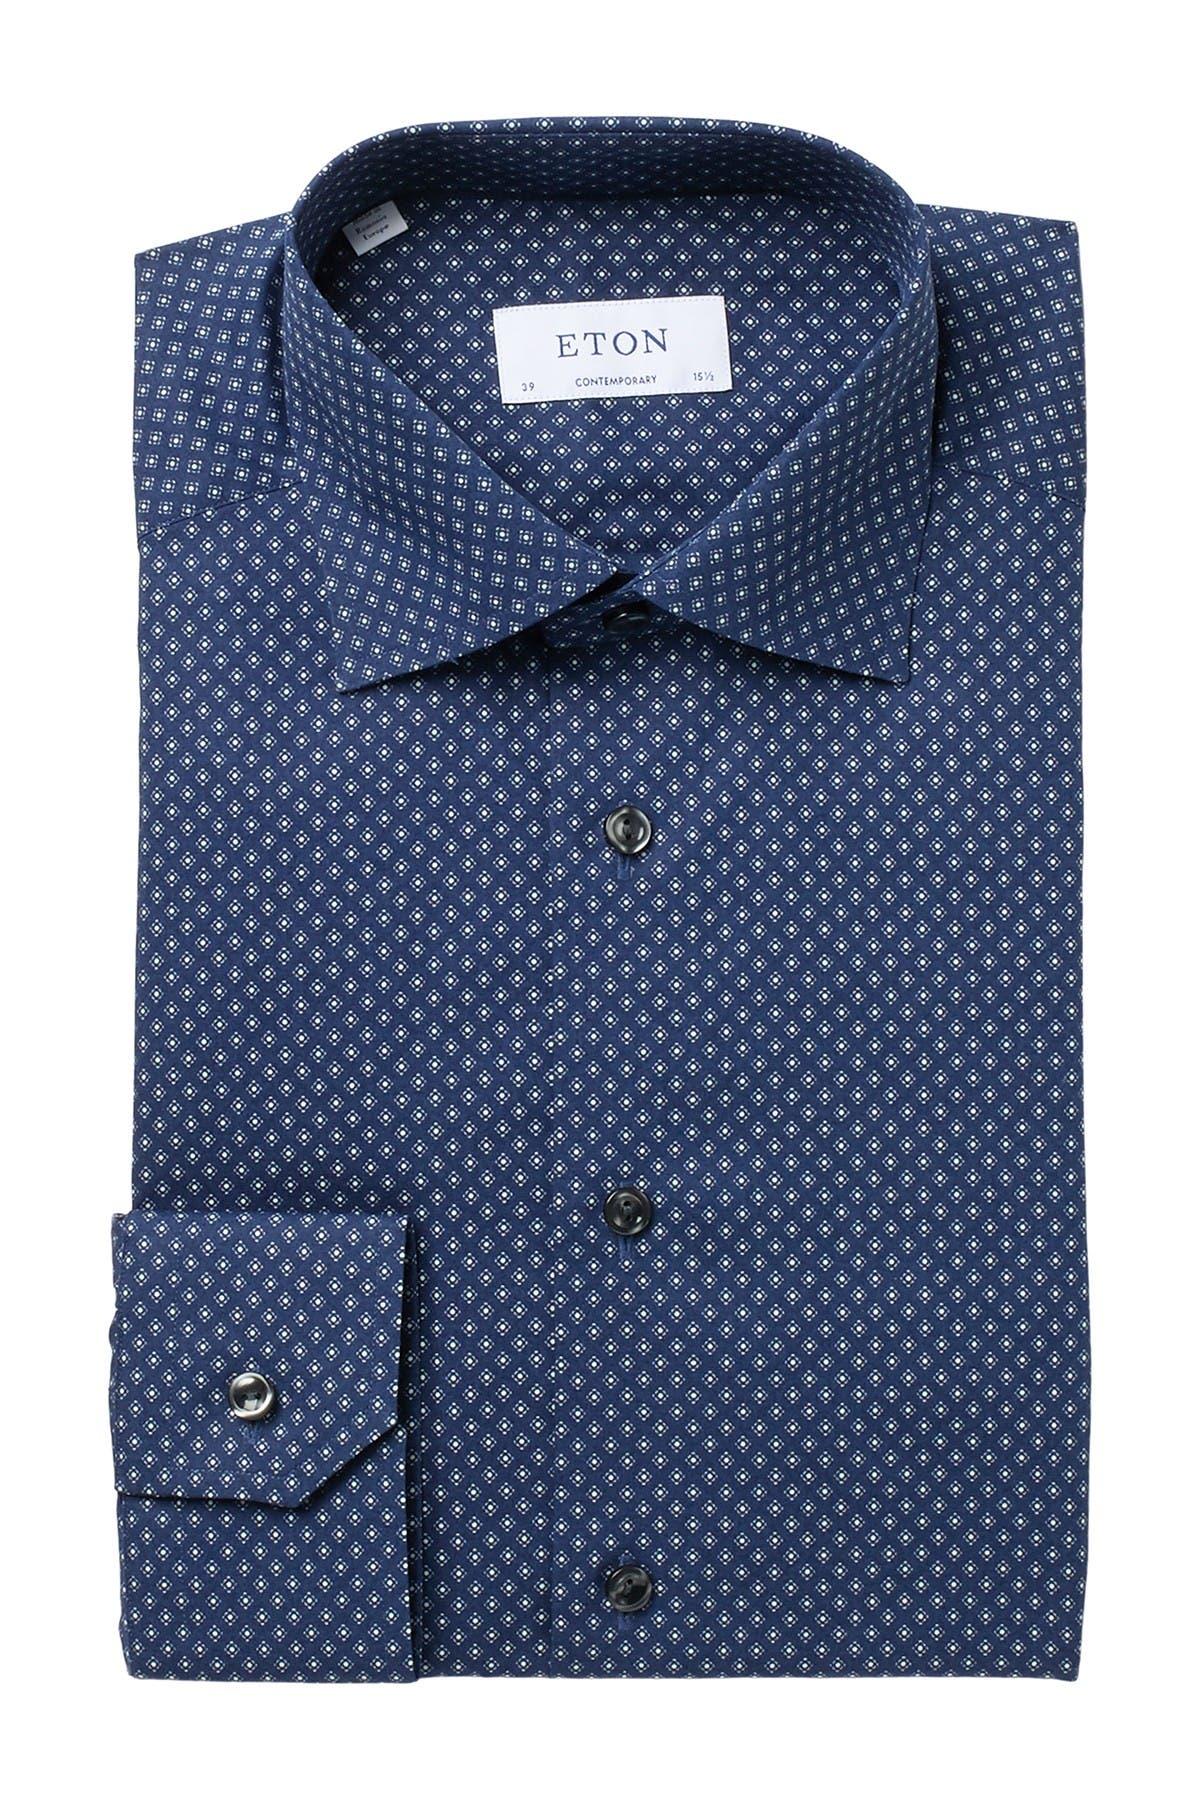 Image of Eton Micro Print Poplin Slim Fit Dress Shirt